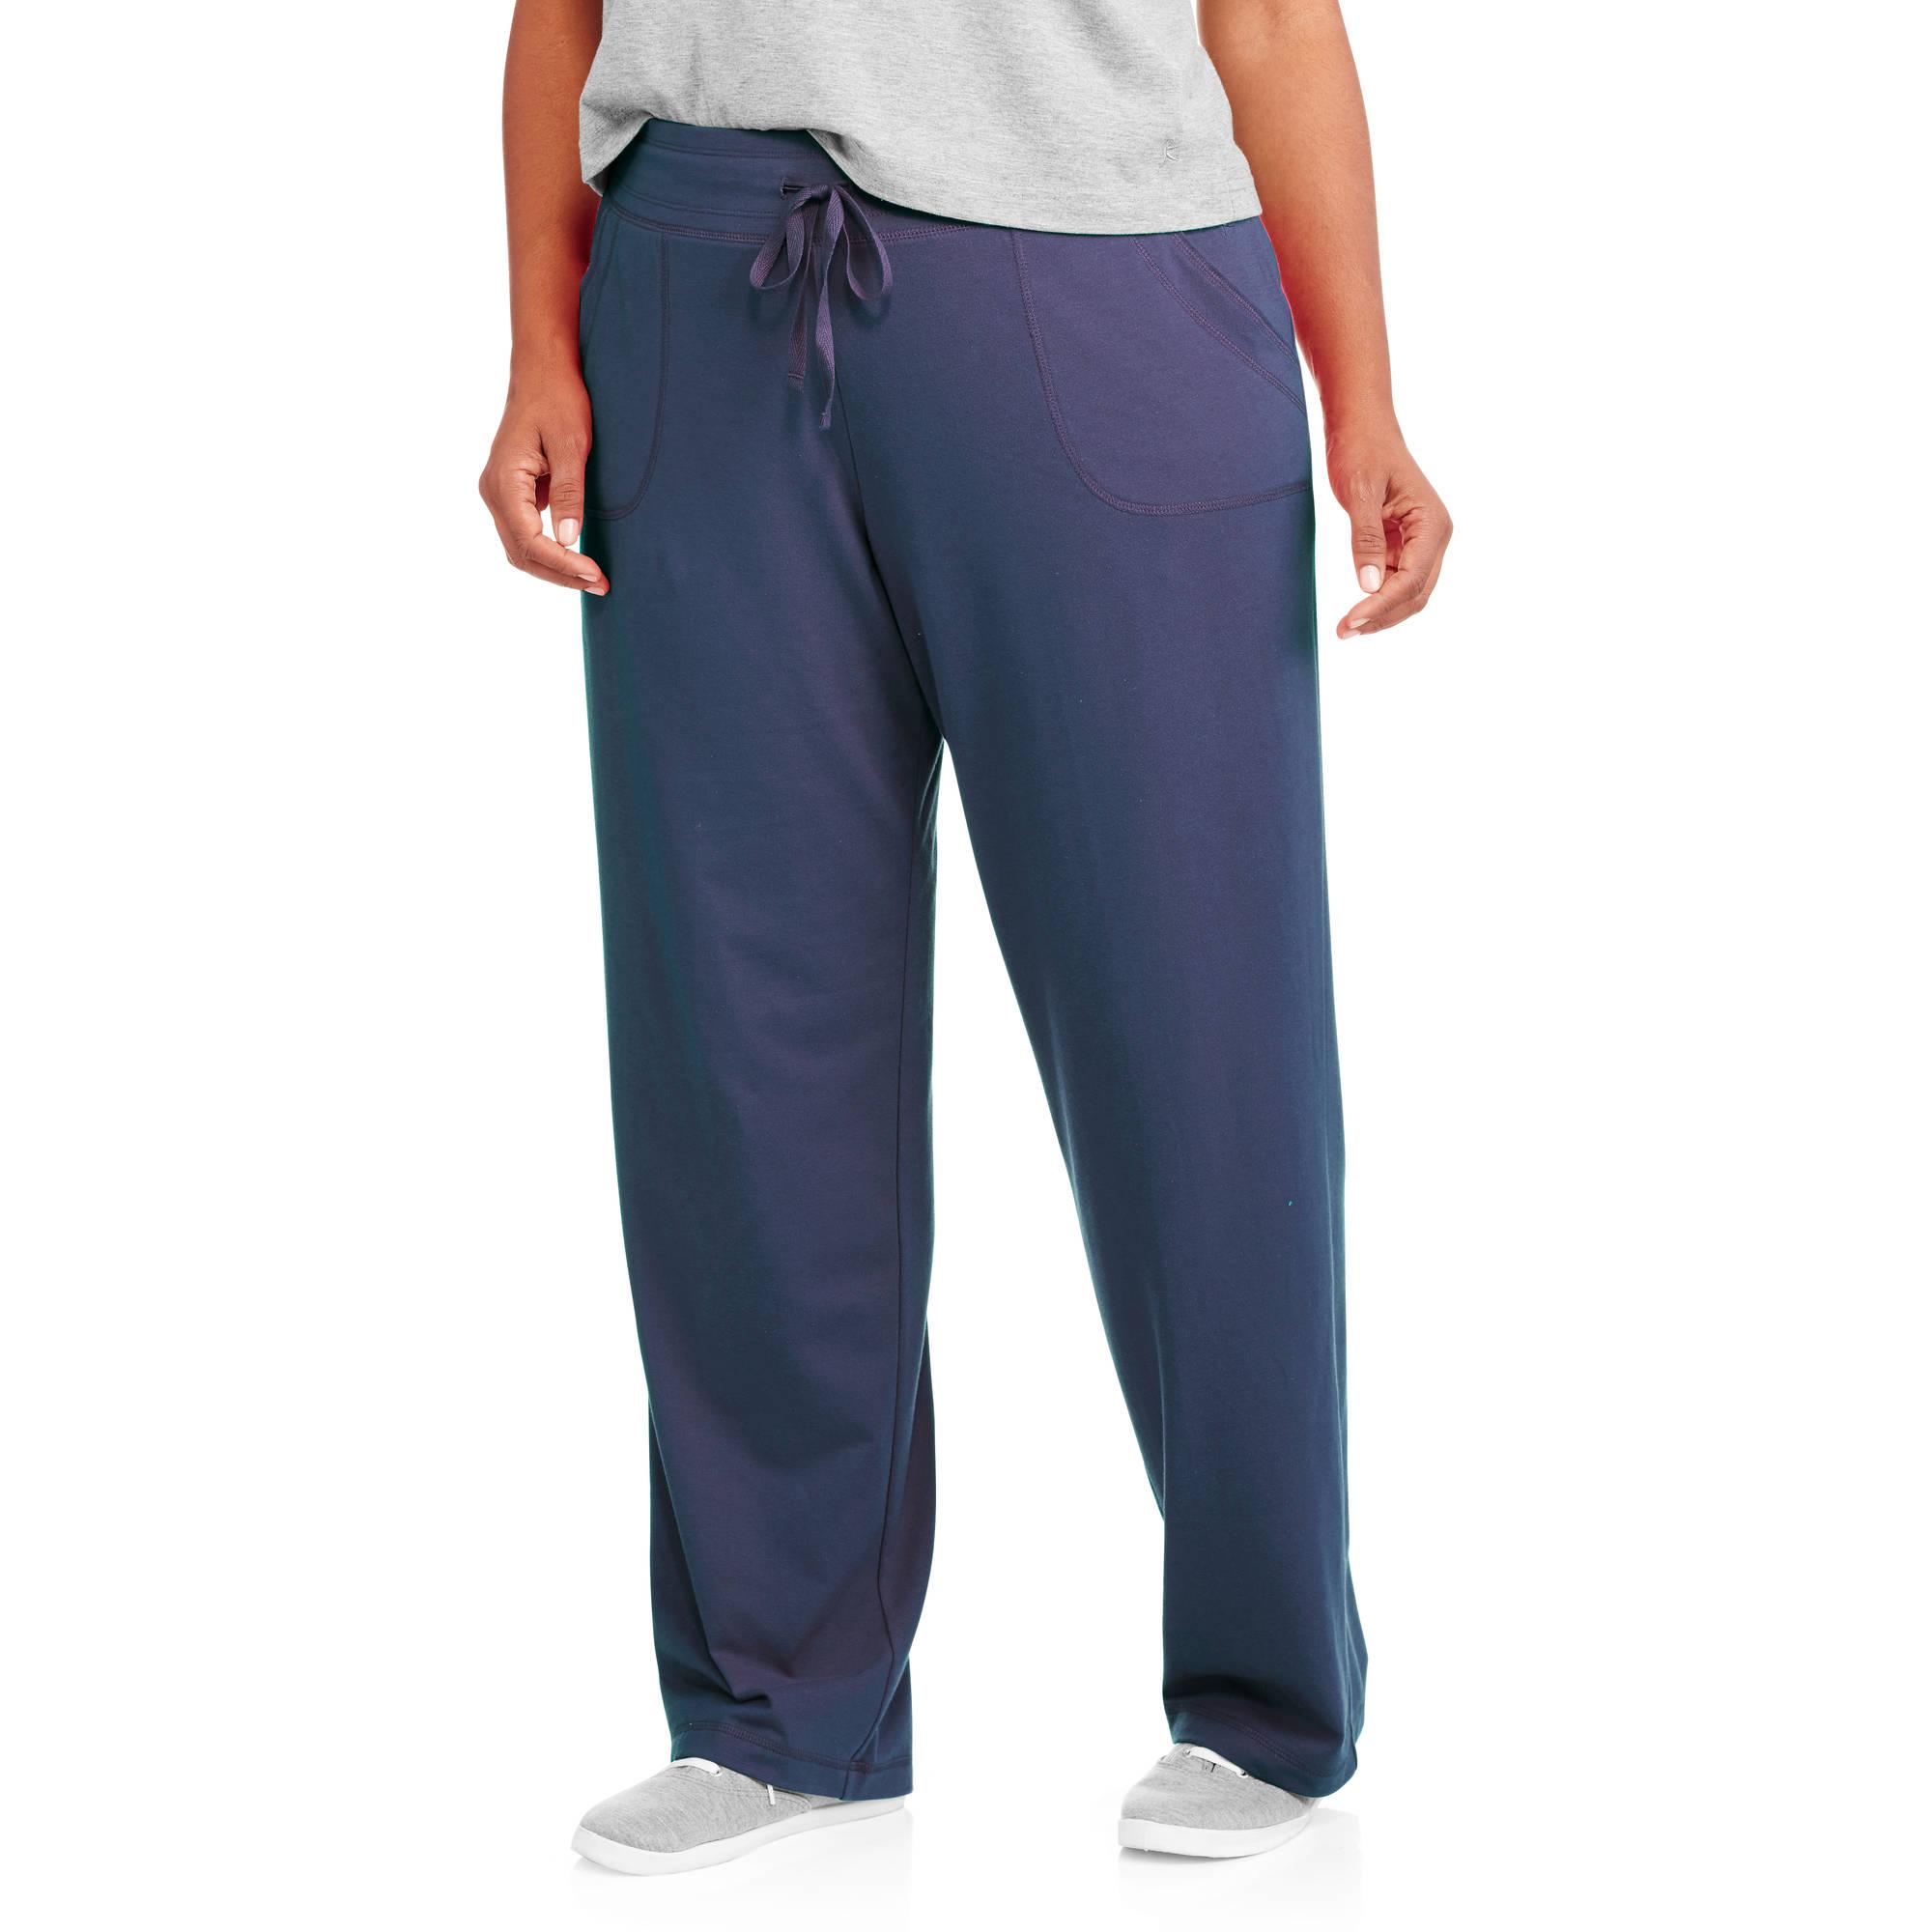 Danskin Now Women's Plus-Size Essential Knit Pants with Drawstring